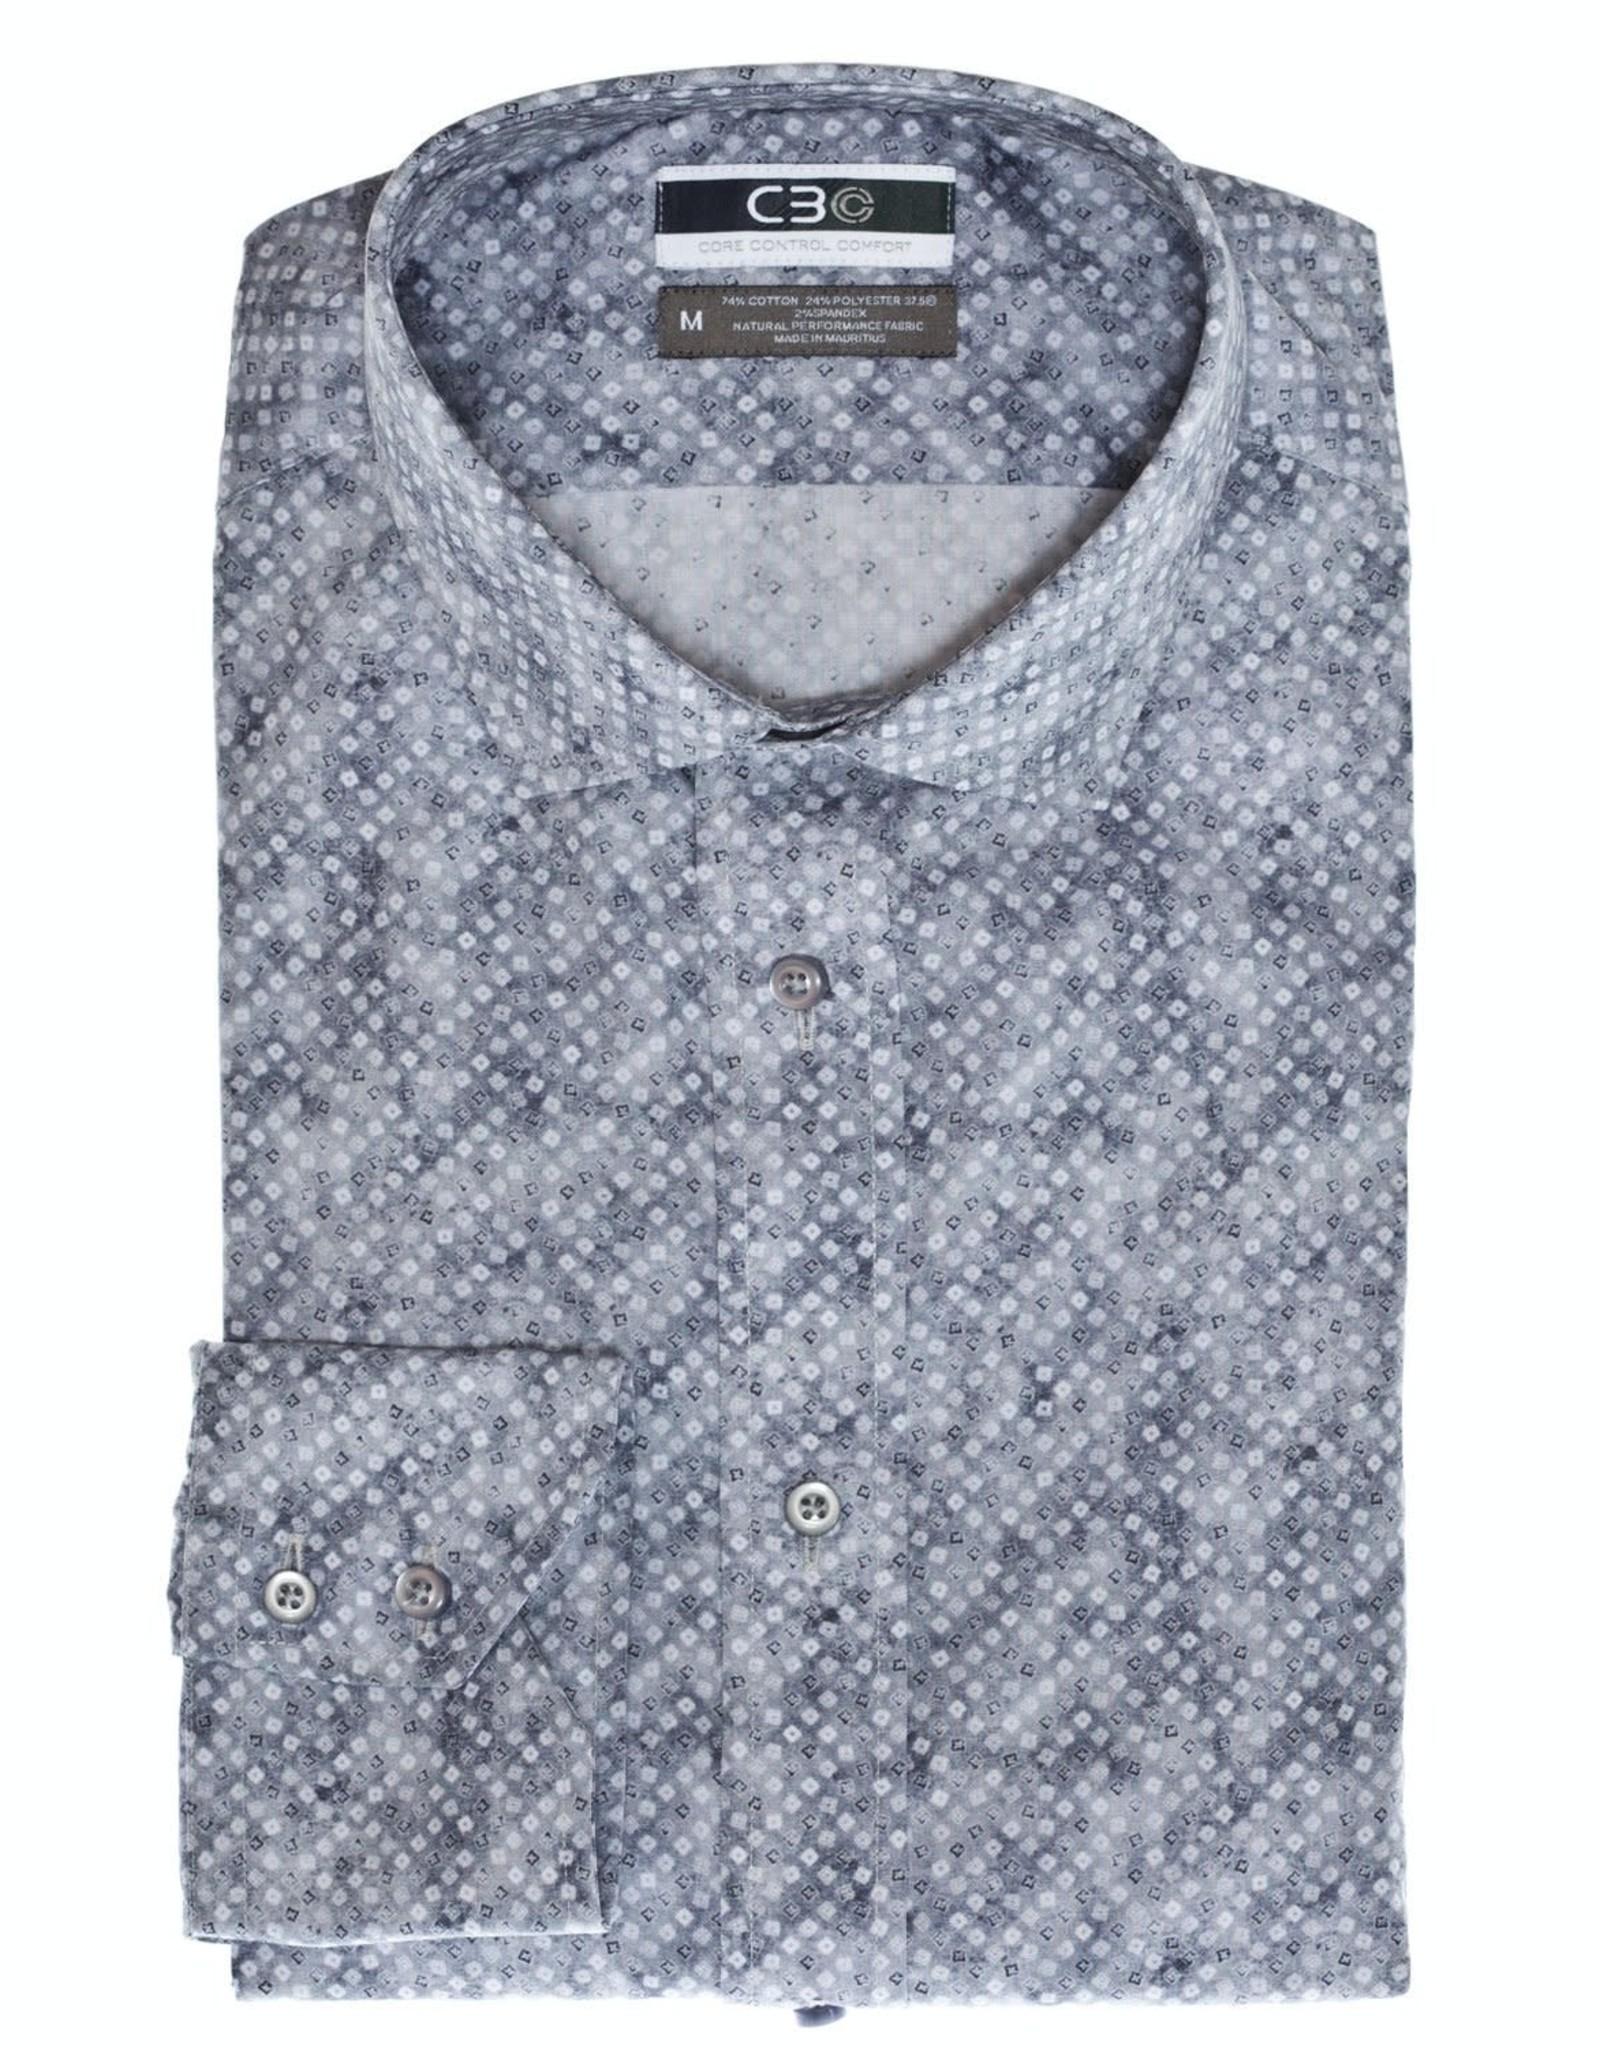 Thomas Dean & Co C3 Square Print Performance Sport Shirt